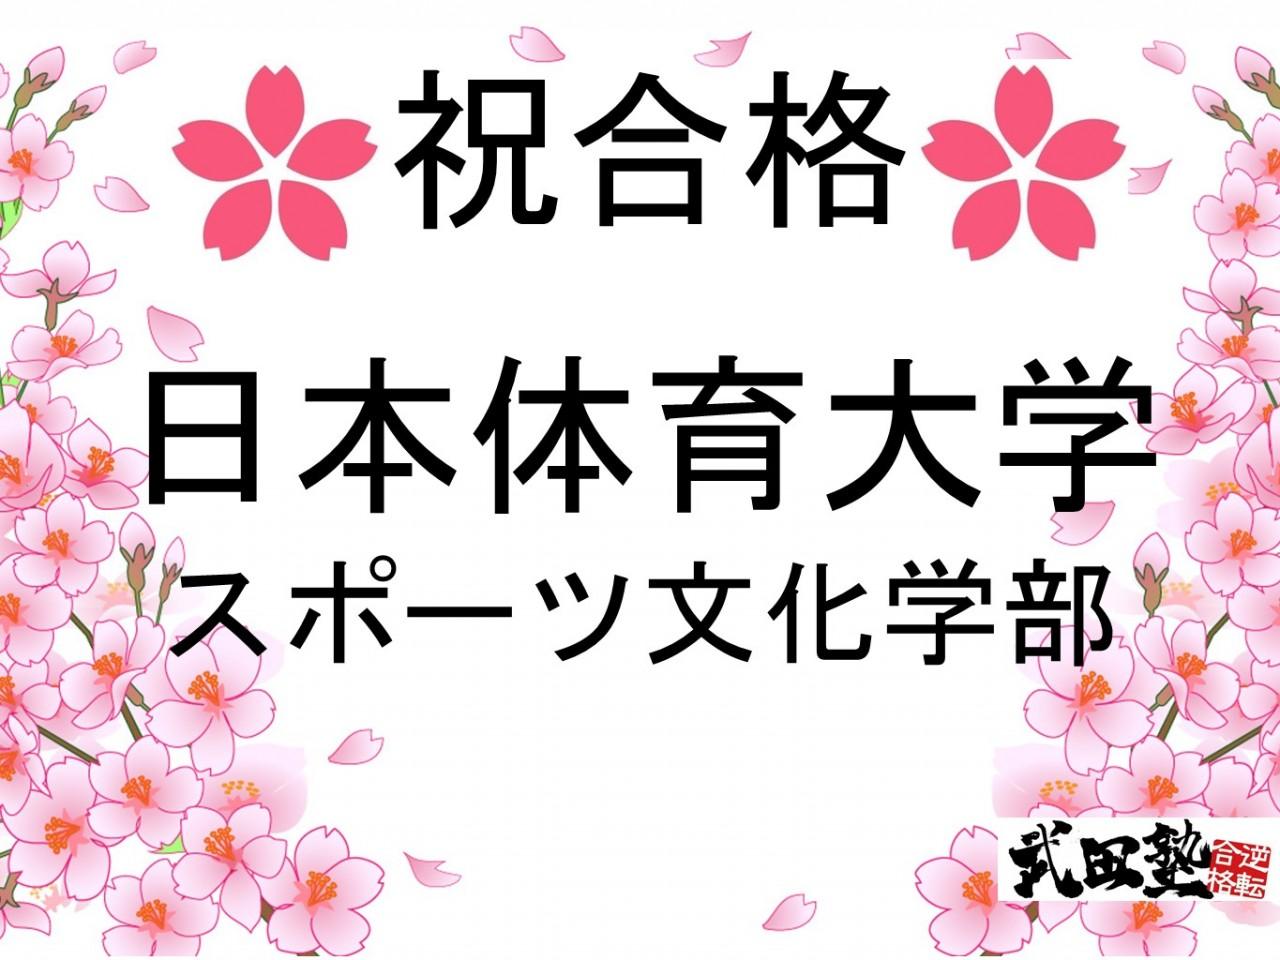 日本体育大学スポーツ文化大学